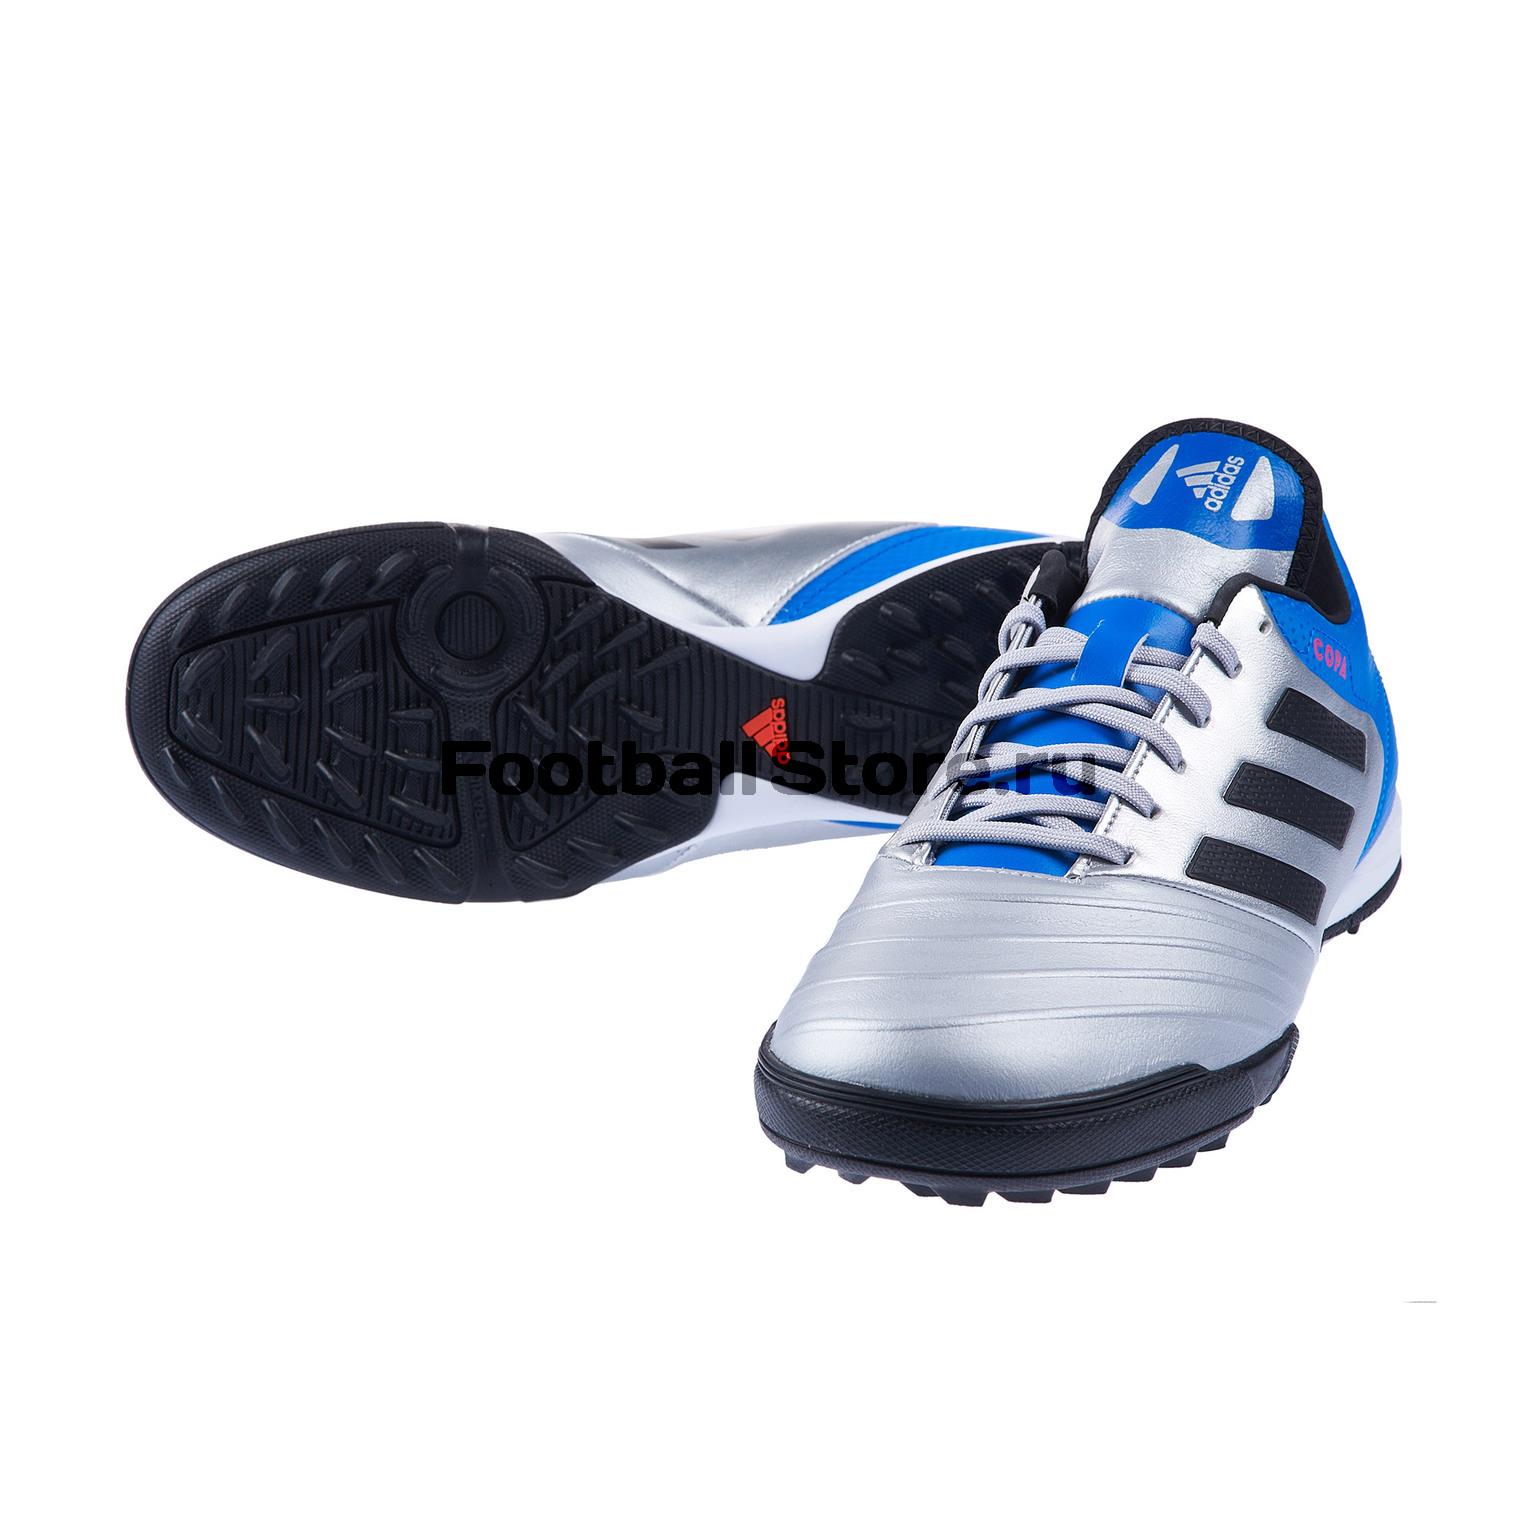 Шиповки Adidas Copa Tango 18.3 TF DB2410 цена